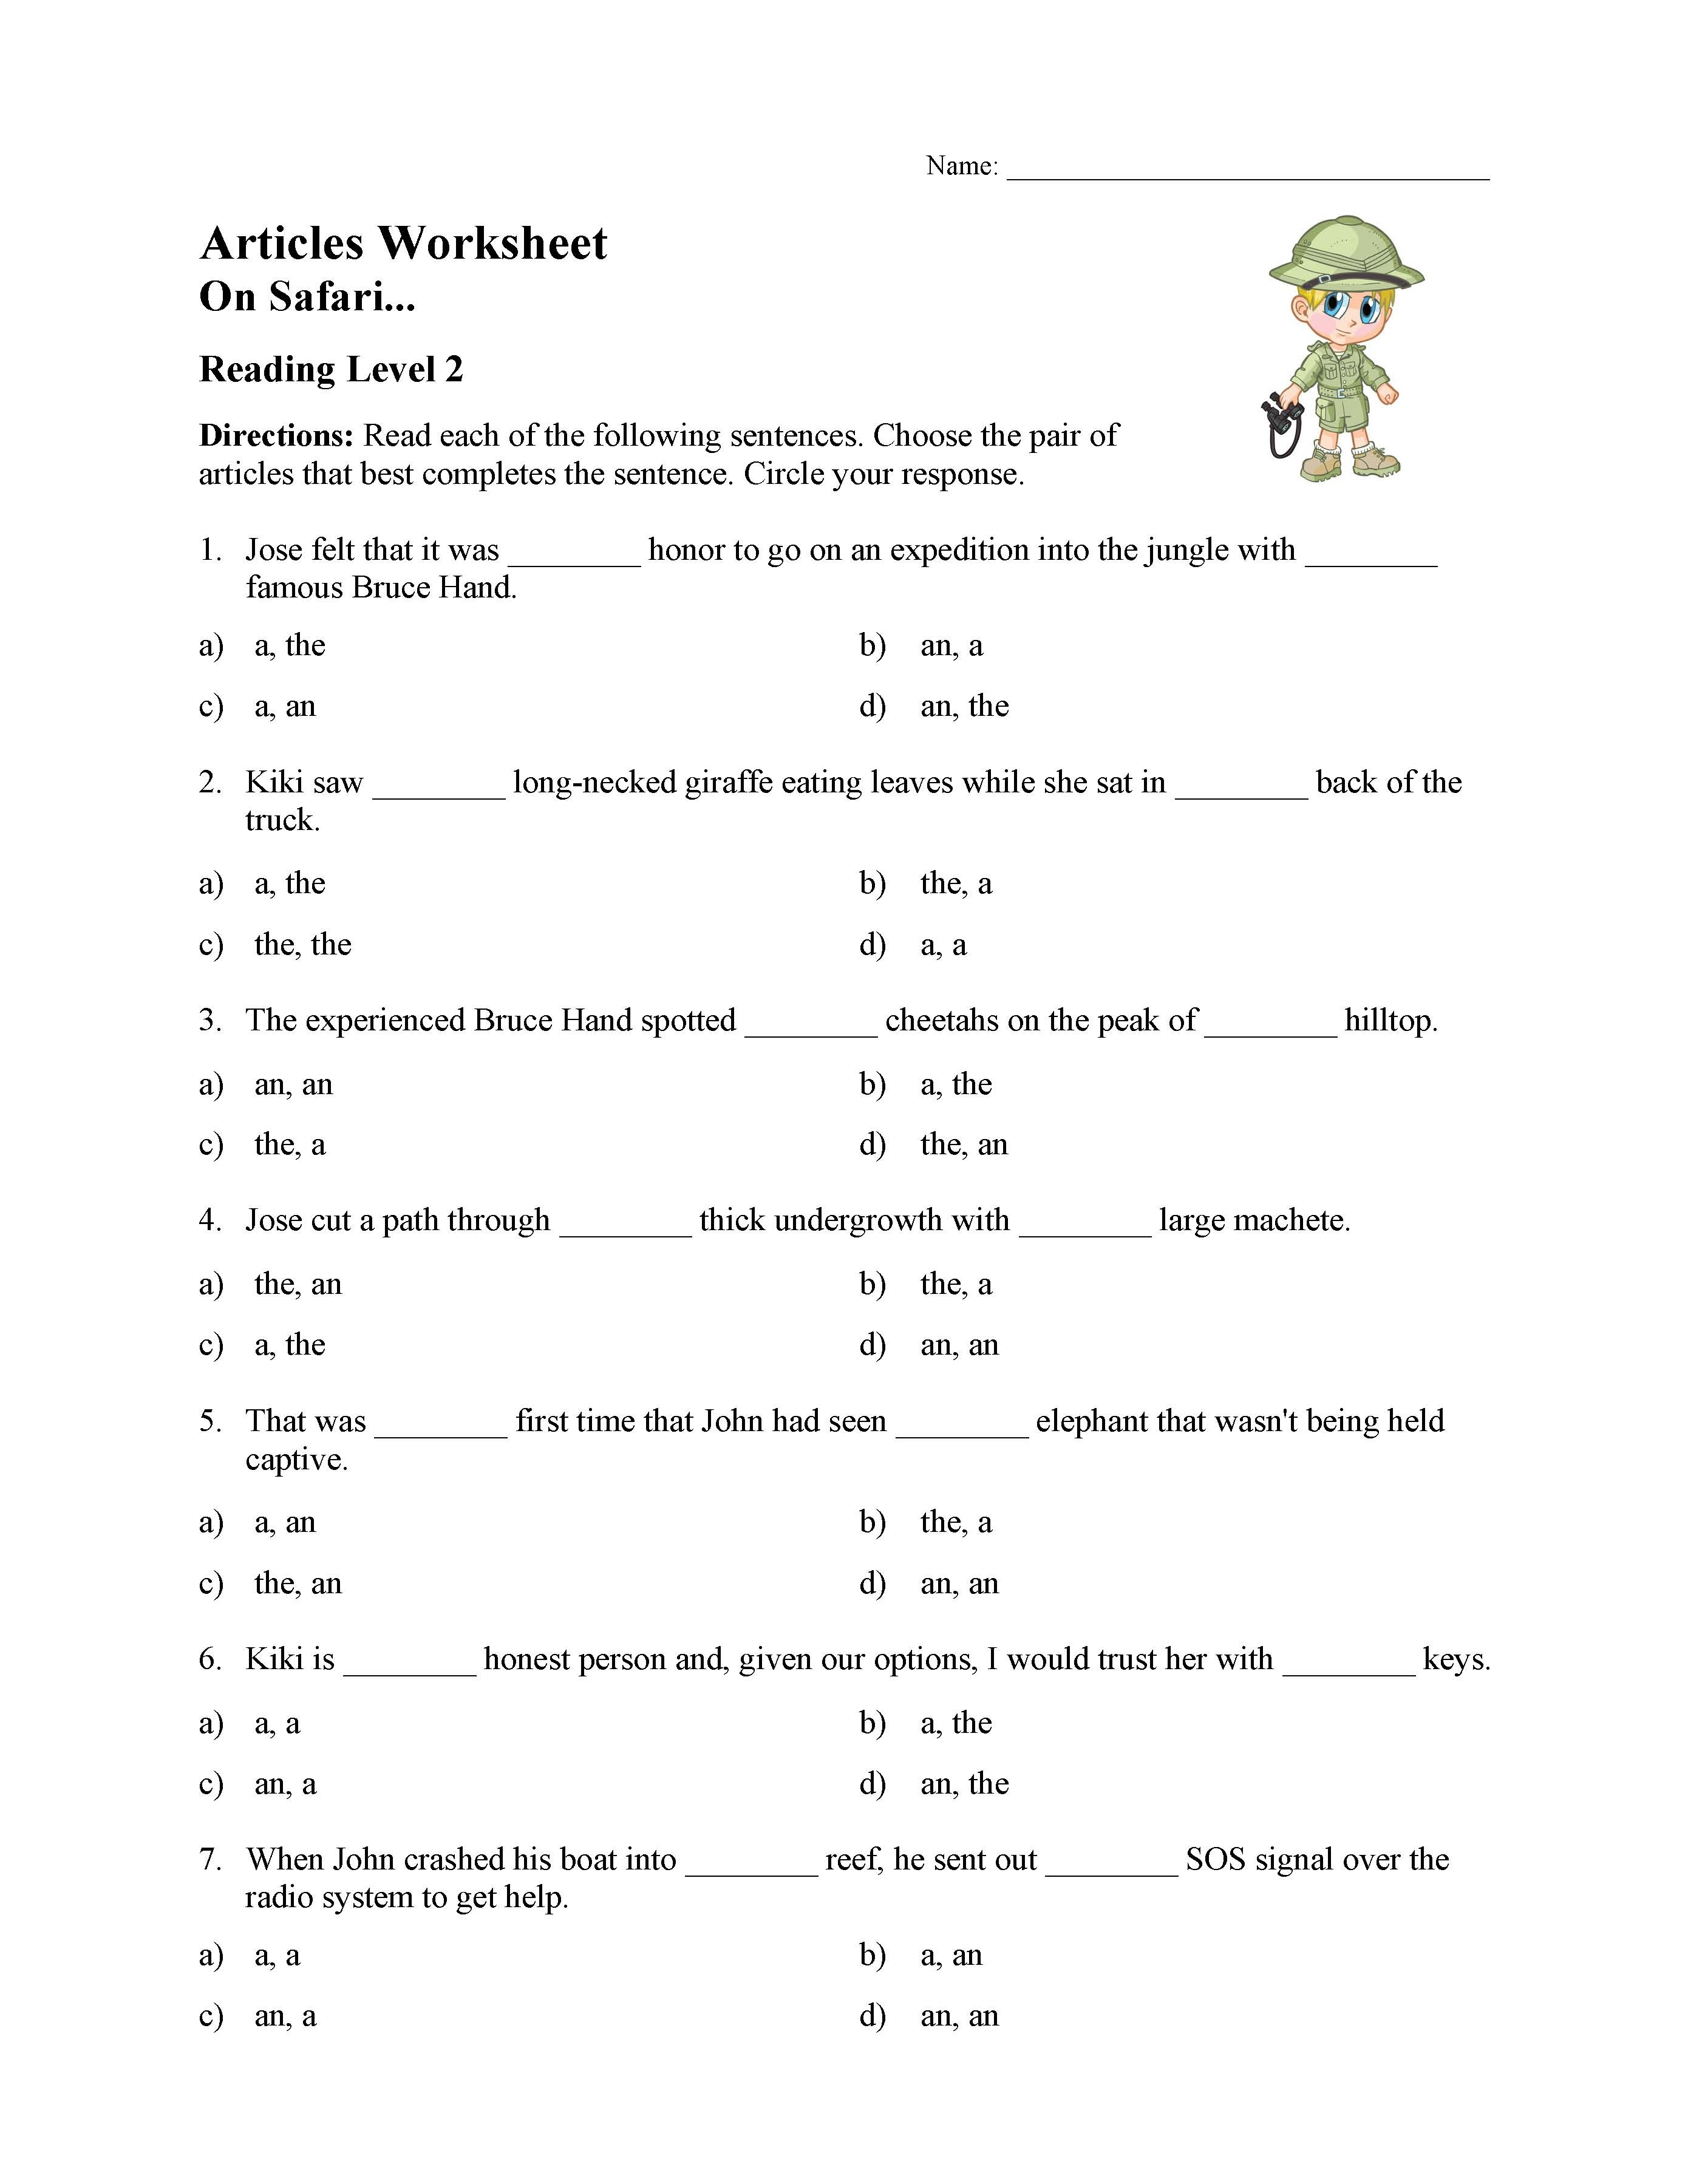 Worksheet In Articles